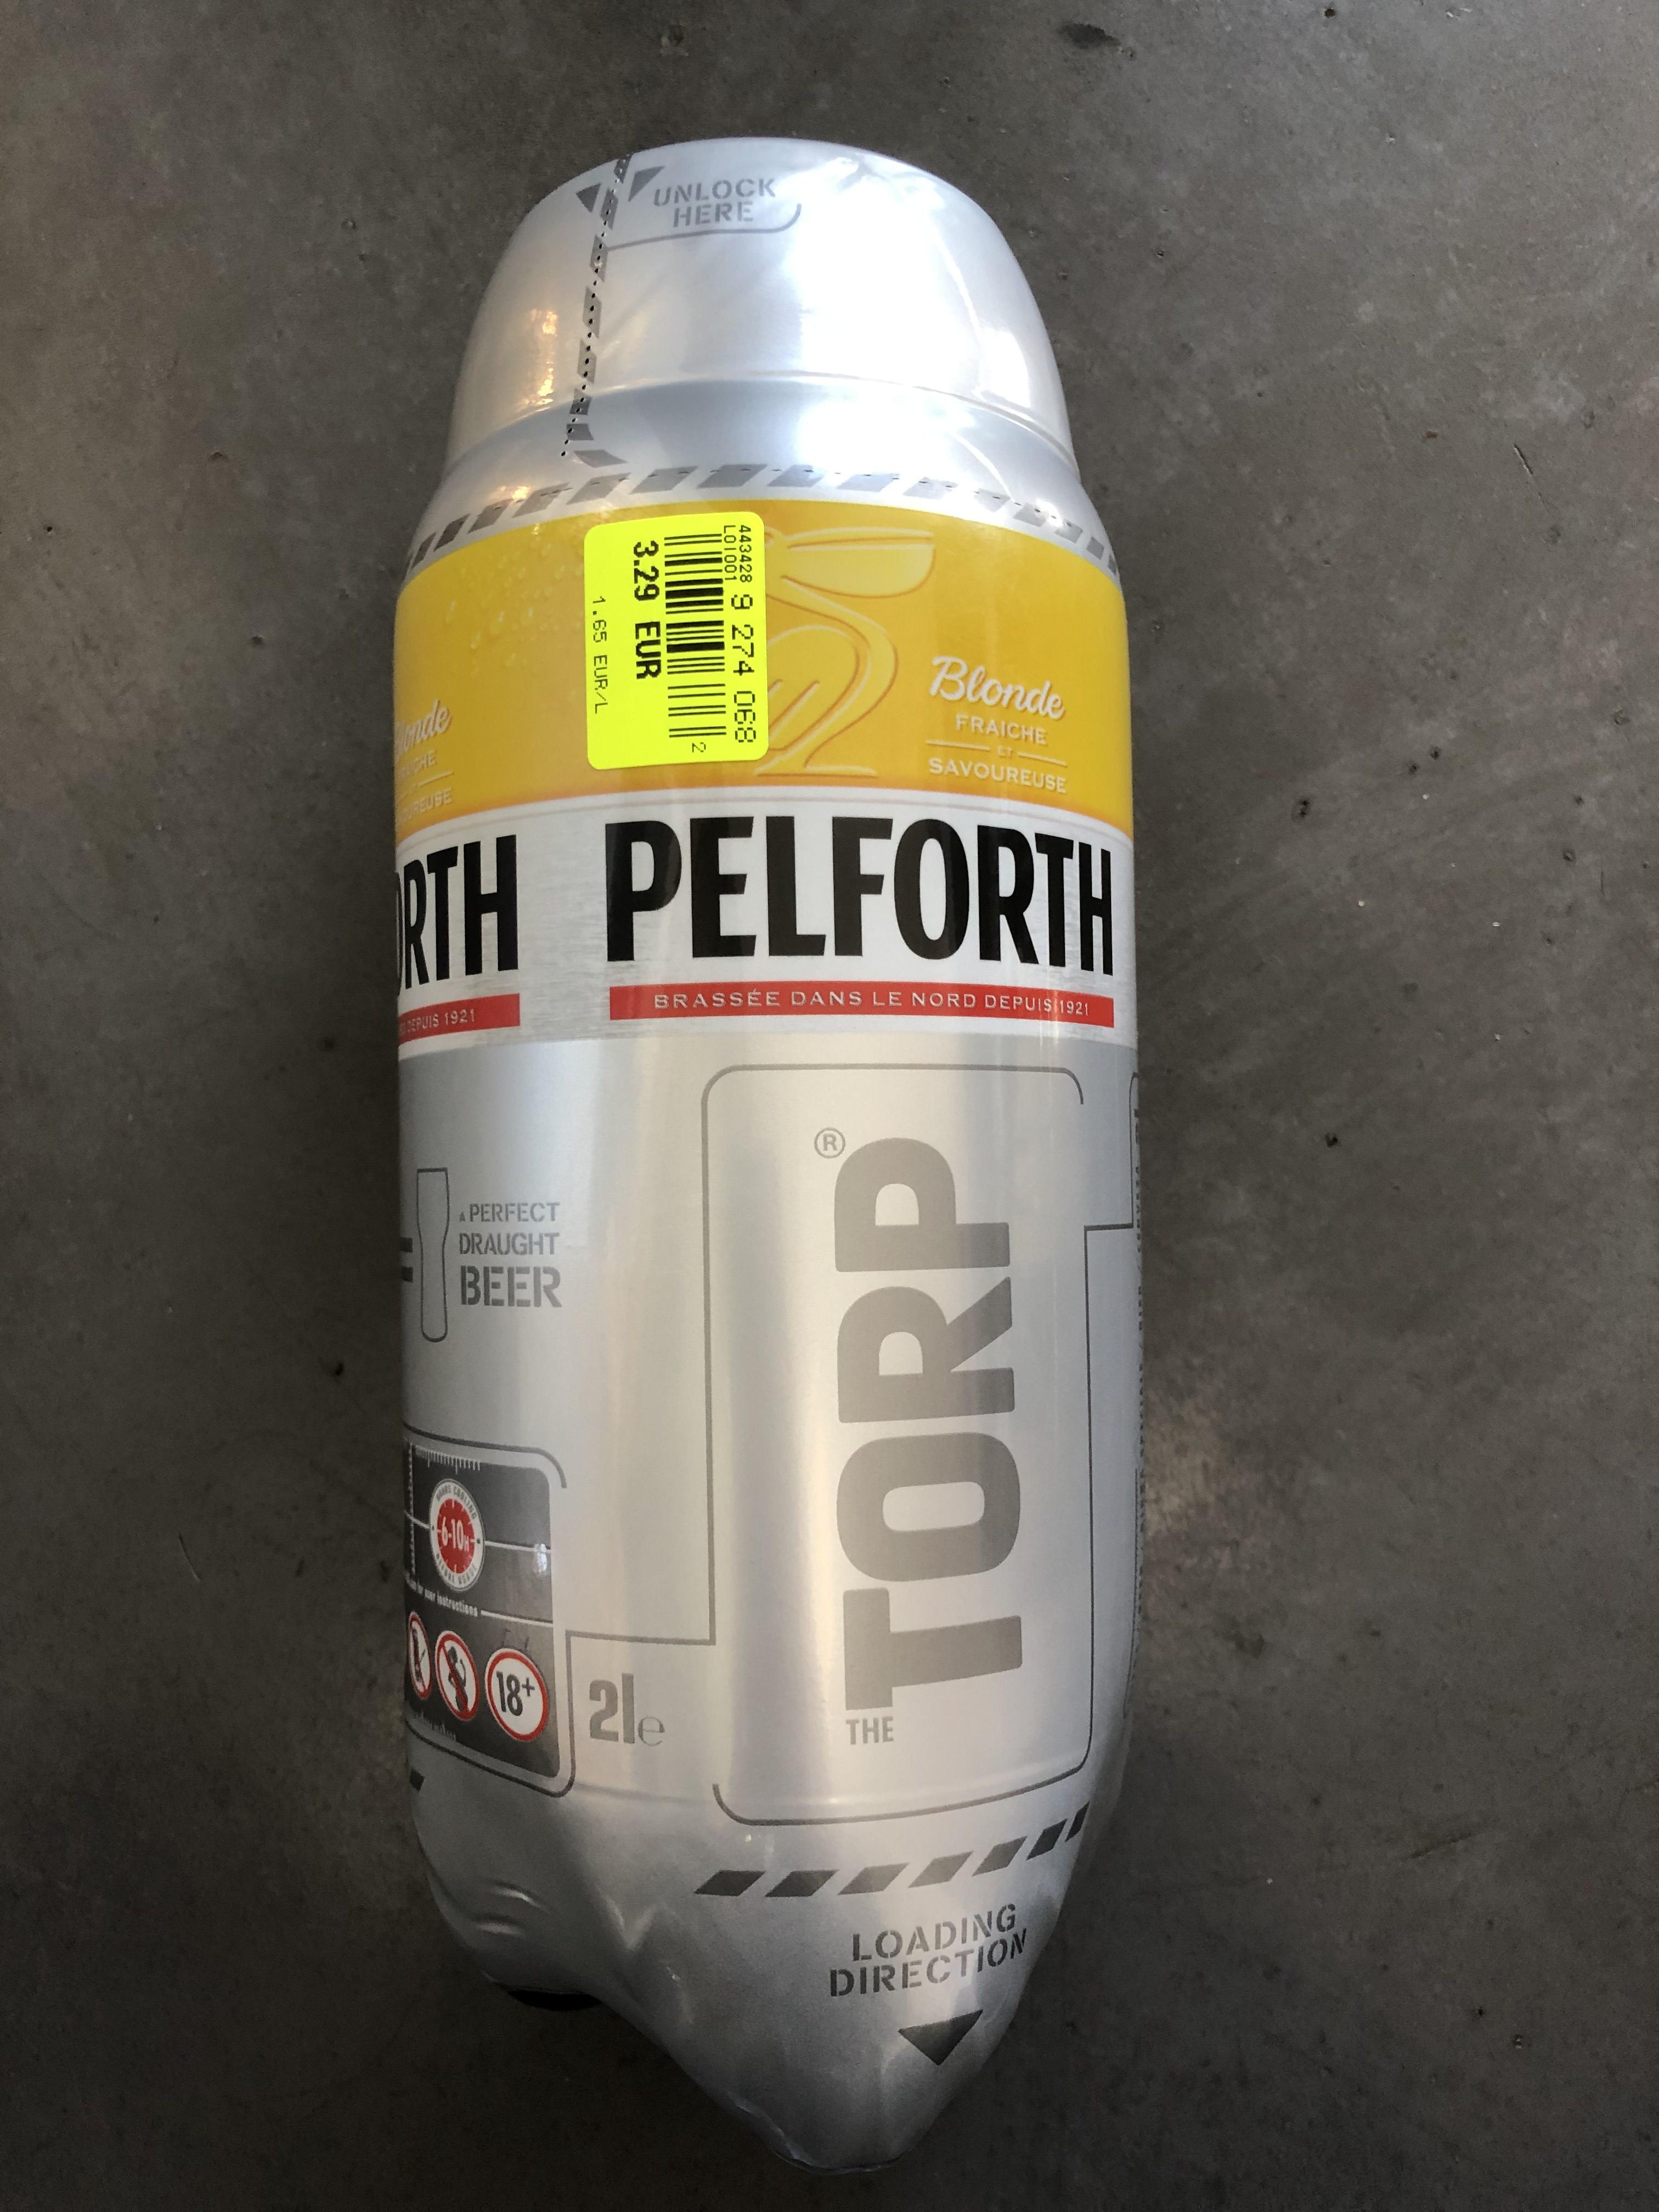 Fut de bière Torp Pelforth de 2L - Angers (49)